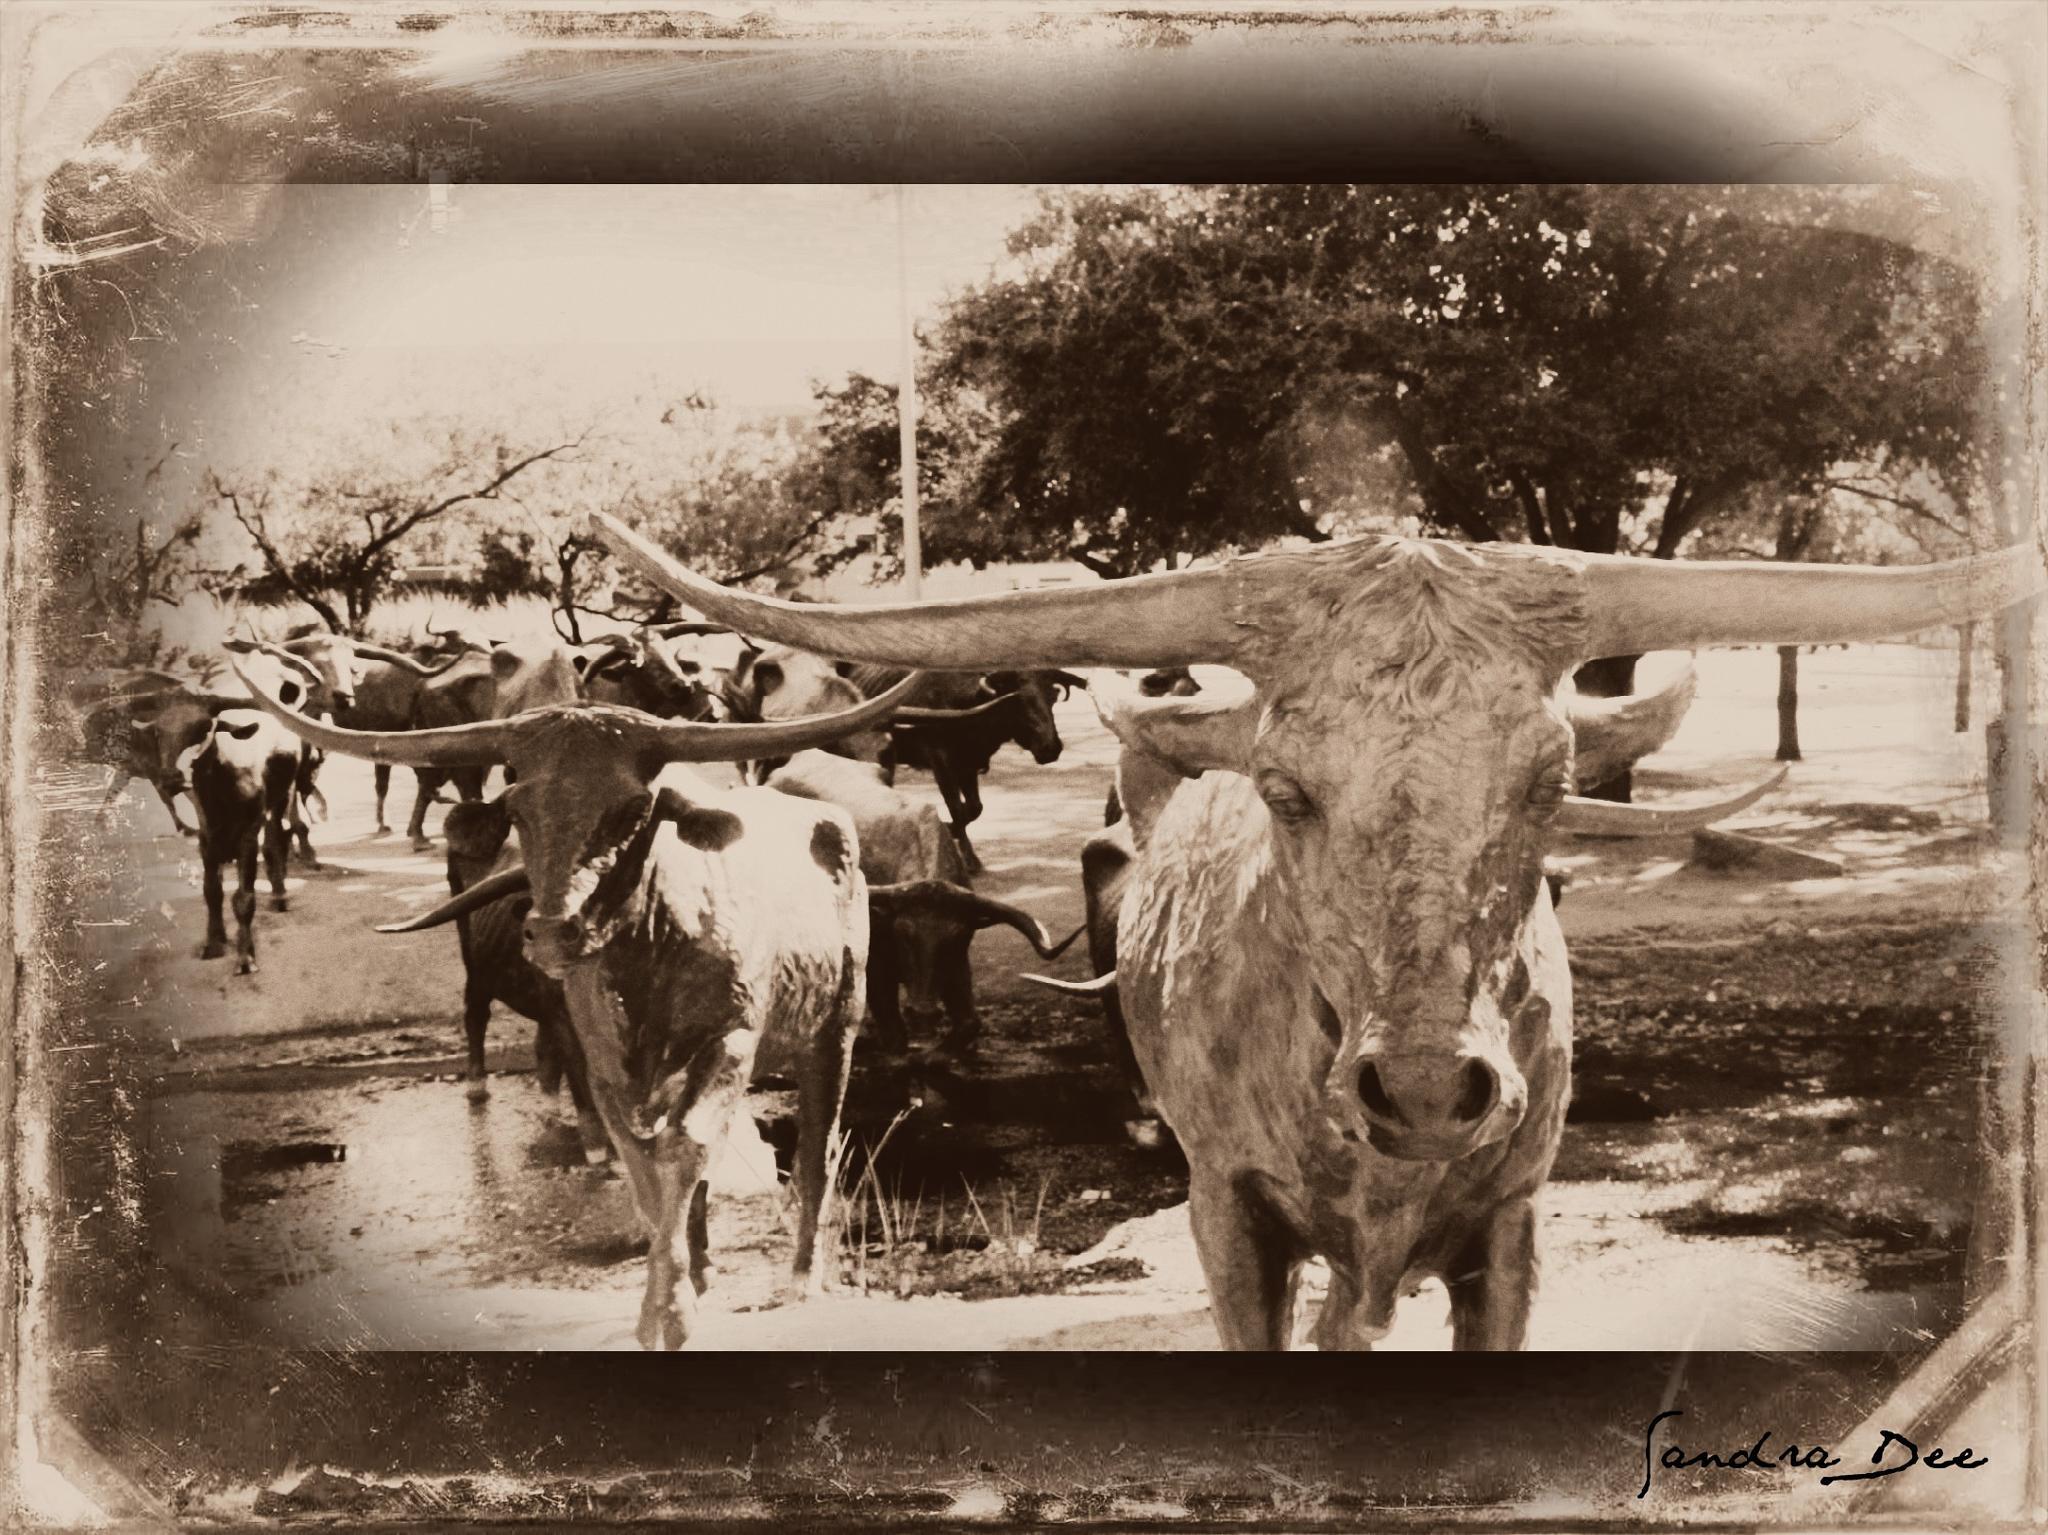 Pioneer Plaza Cattle Drive 15 by sandra.sherman.7334